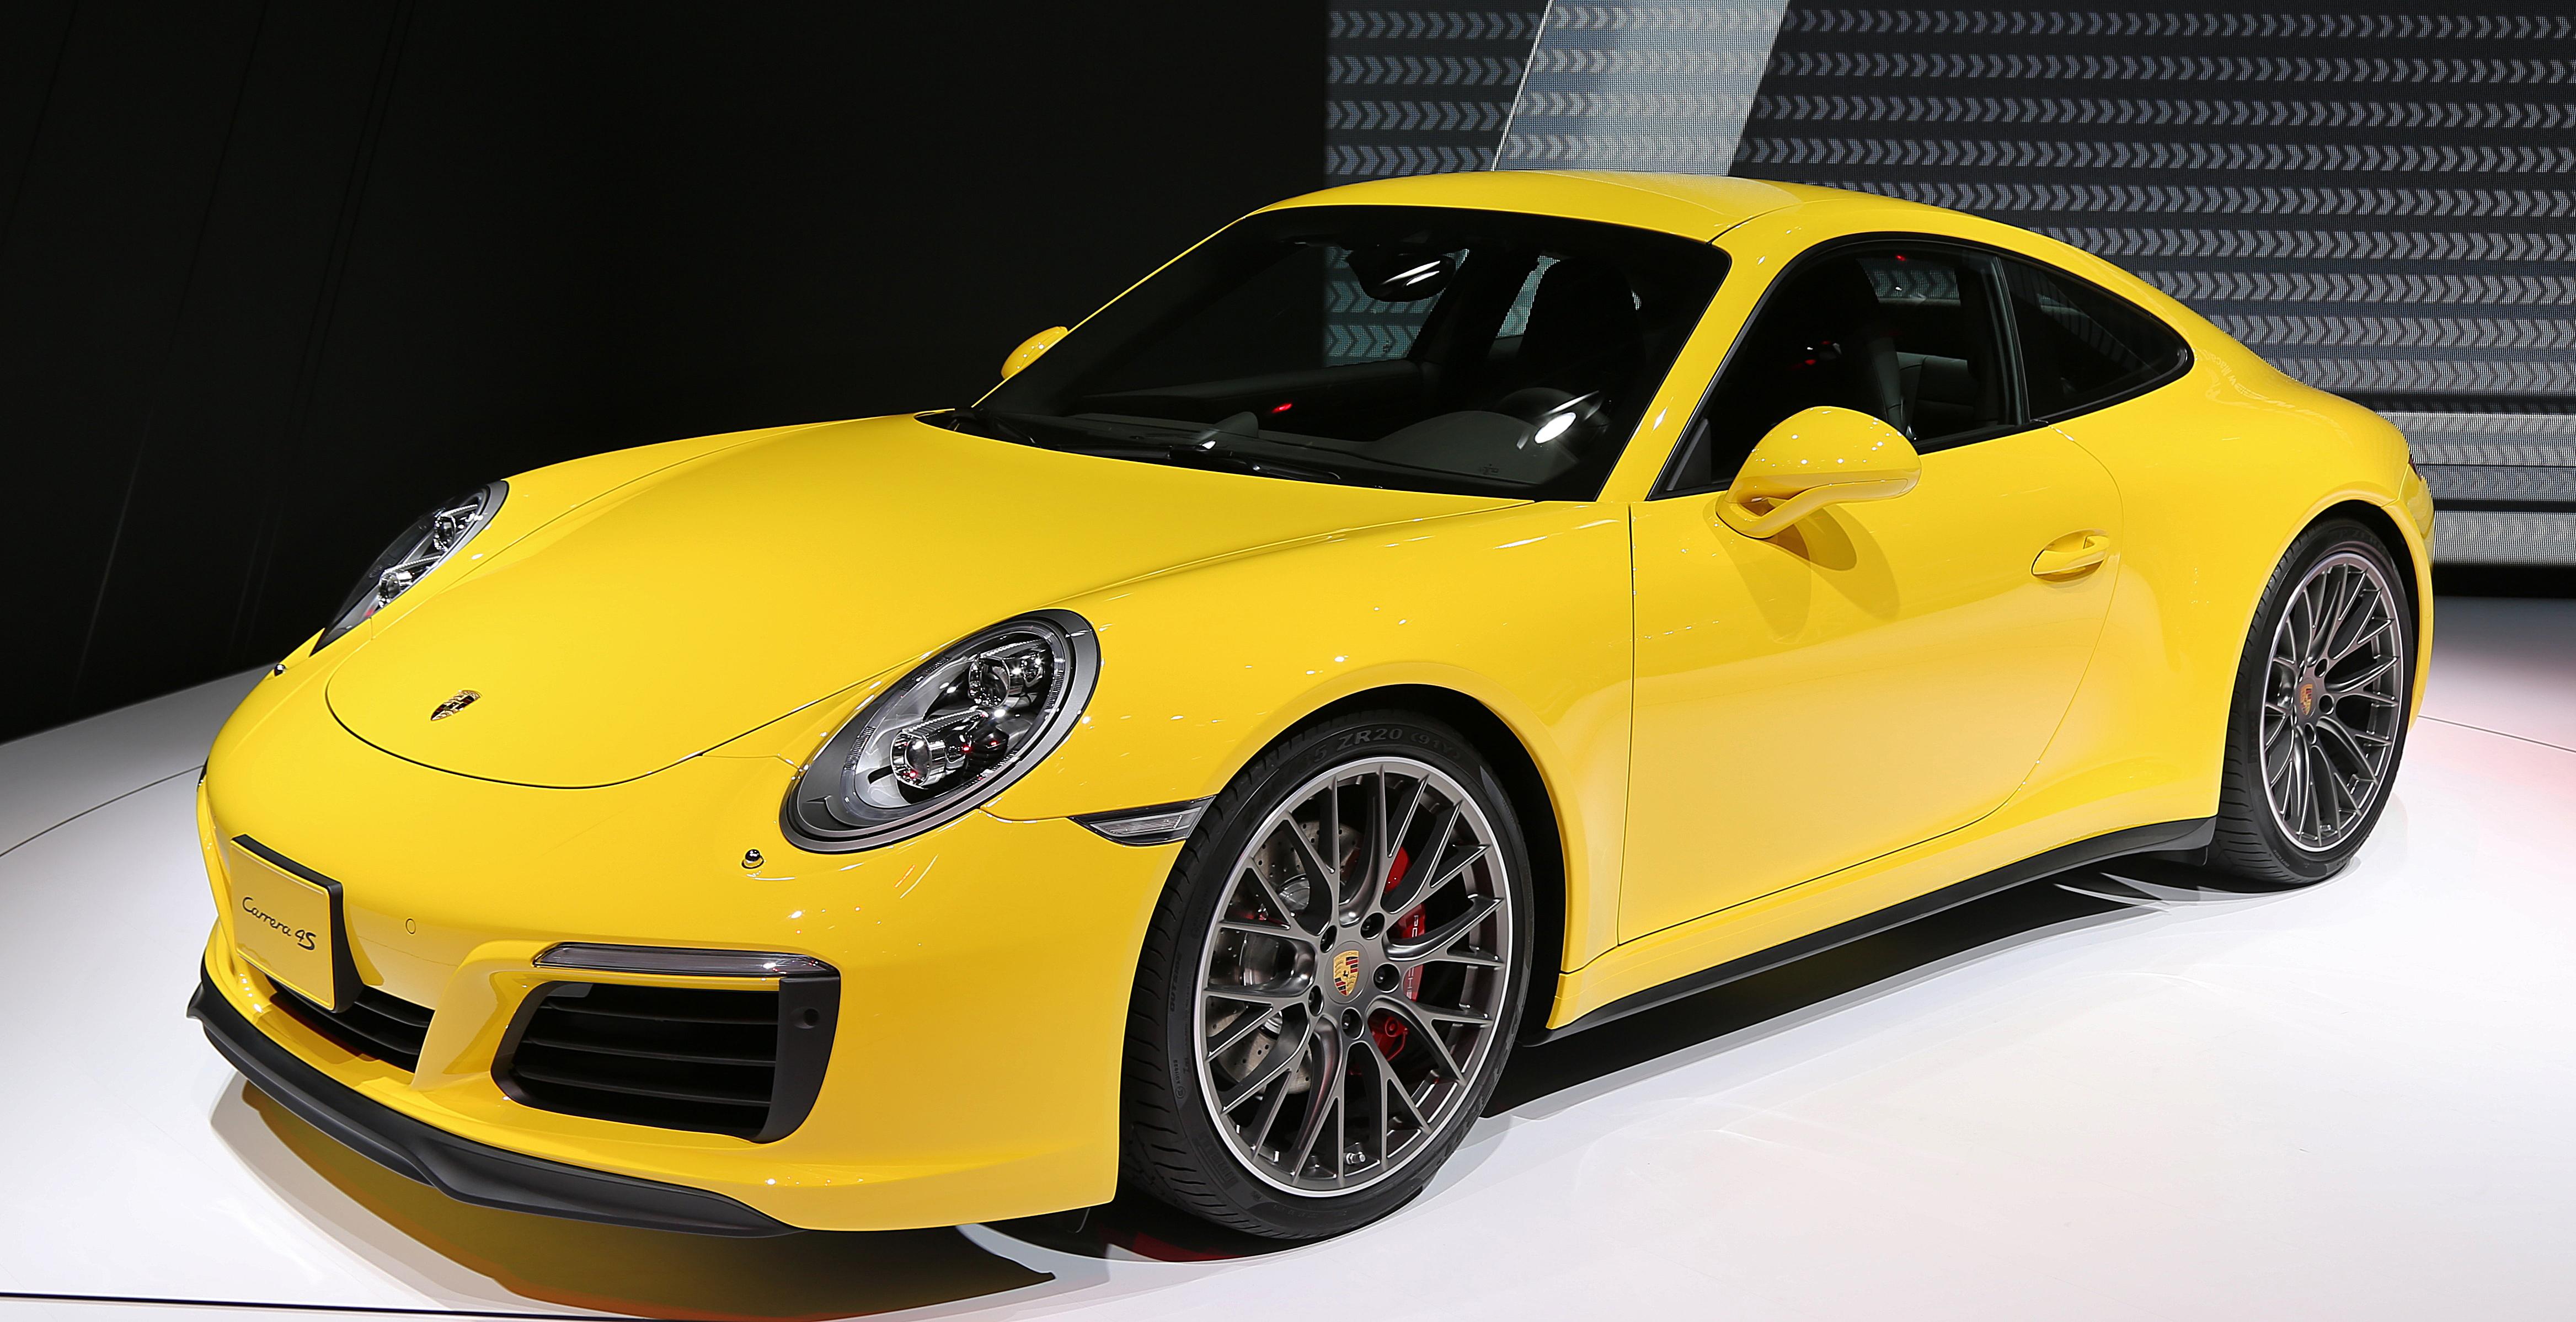 2015 Porsche 911 Carrera 4S Coupe.jpg